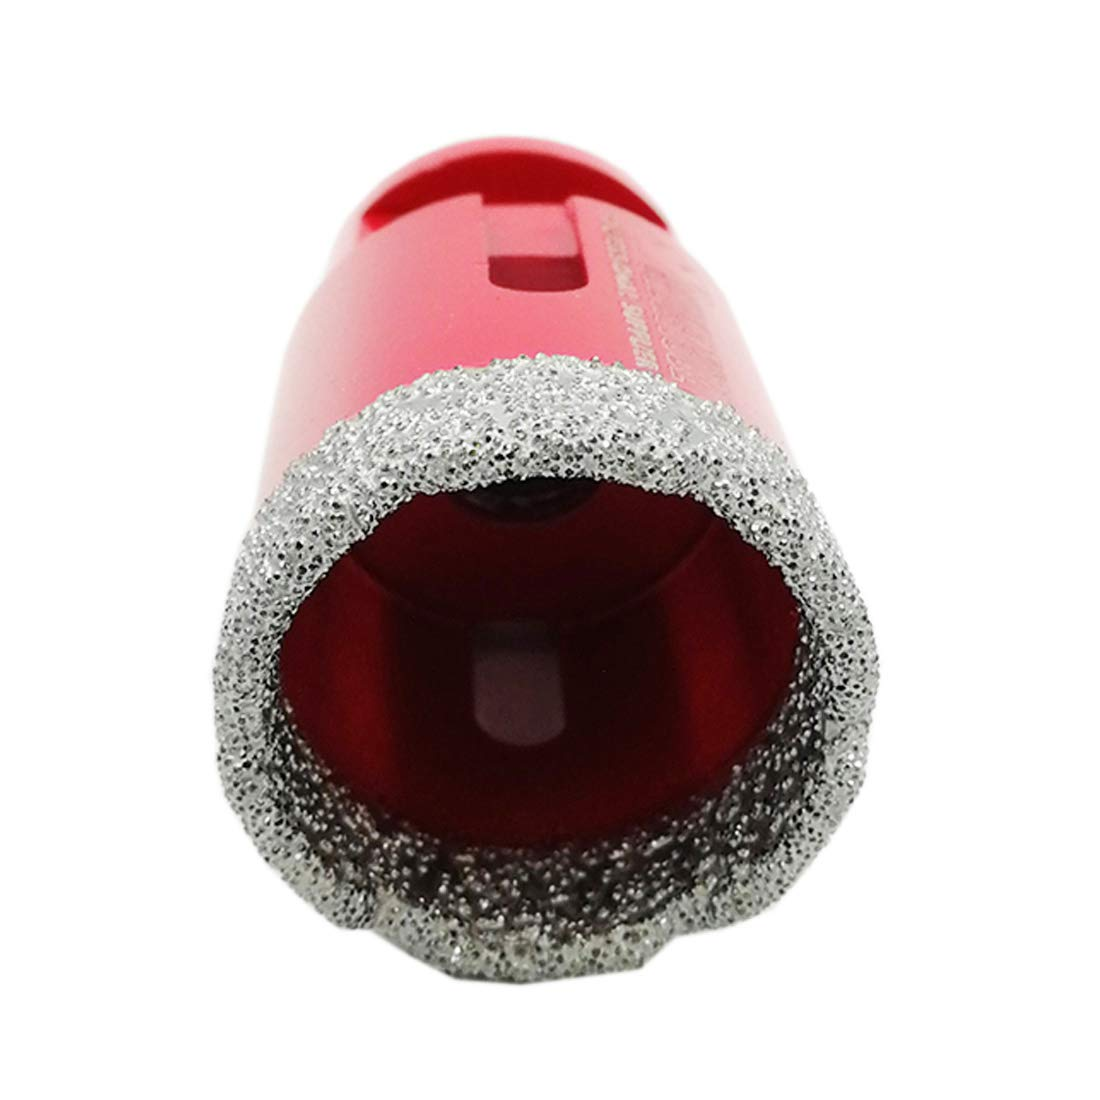 SHDIATOOL Trockene Diamant-bohrkronen Set Vakuumgel/ötete Bohrungen f/ür Porzellan Fliesen Granit Marmor (Durchmesser 25//50//65//75mm)